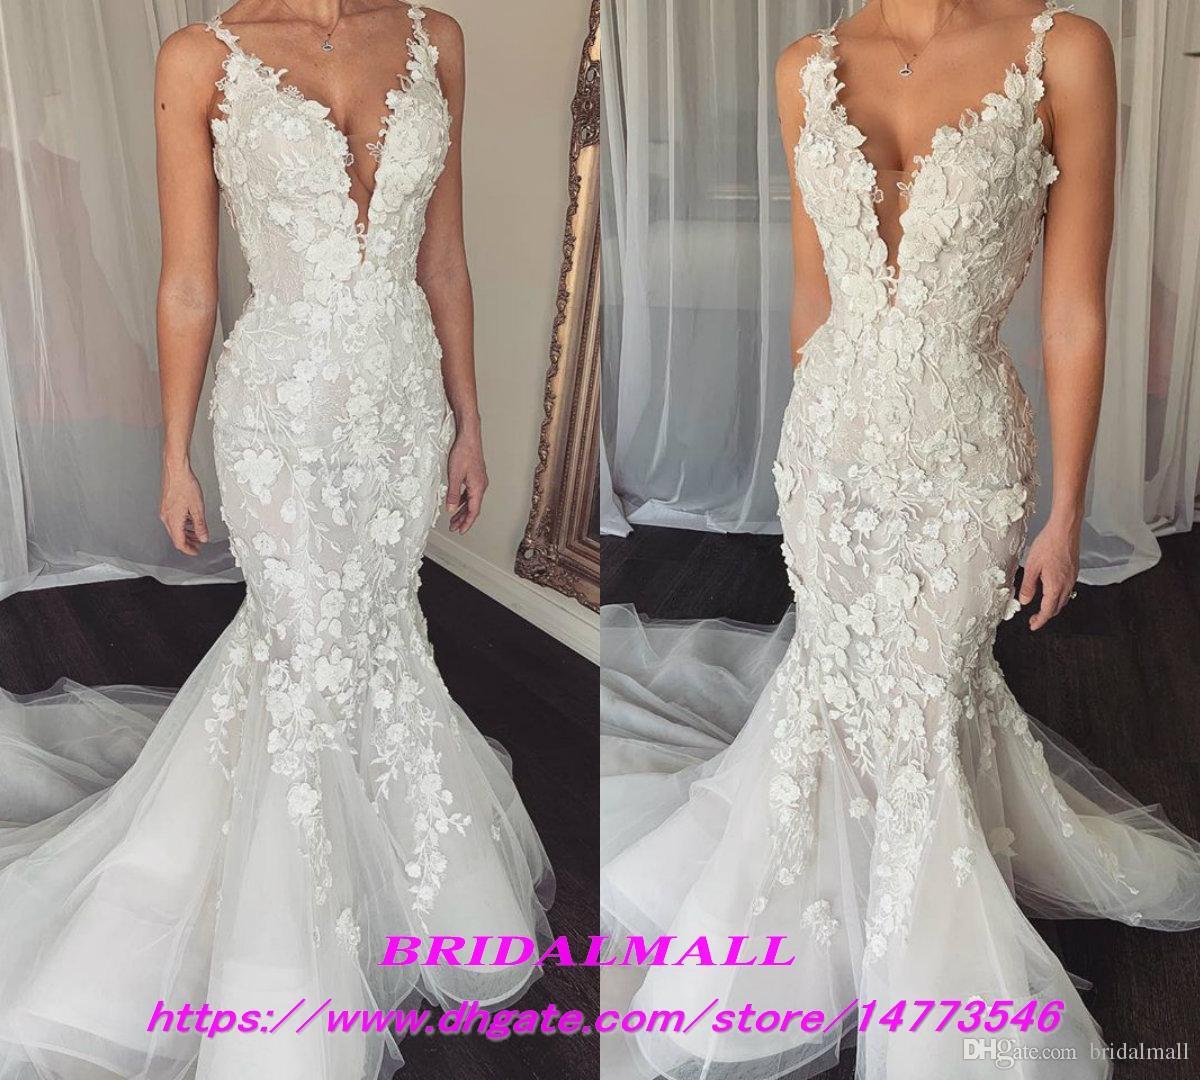 3d Floral Appliqued Tulle Mermaid Wedding Dresses 2019 Elegant Spaghetti Straps Bridal Gowns Custom Fishtail Bride Dresses Vestidos De Novia The